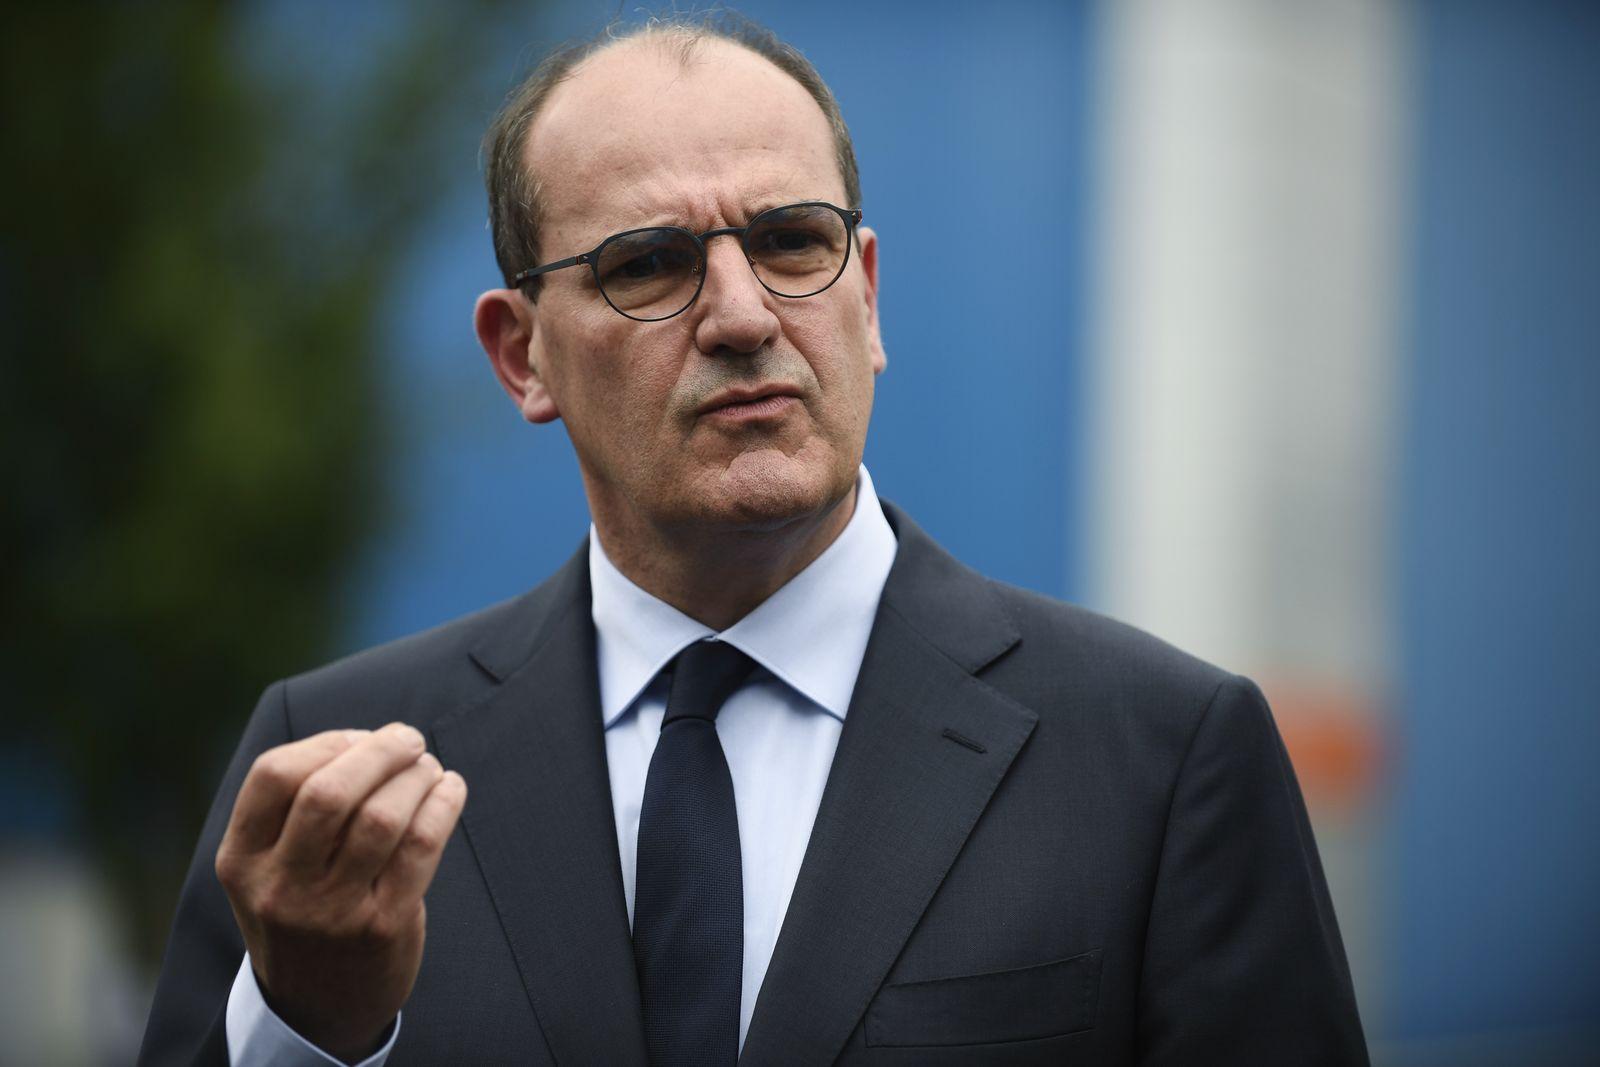 French Prime minister Jean Castex visits X-FAB, Le Coudray Montceaux, France - 04 Jul 2020